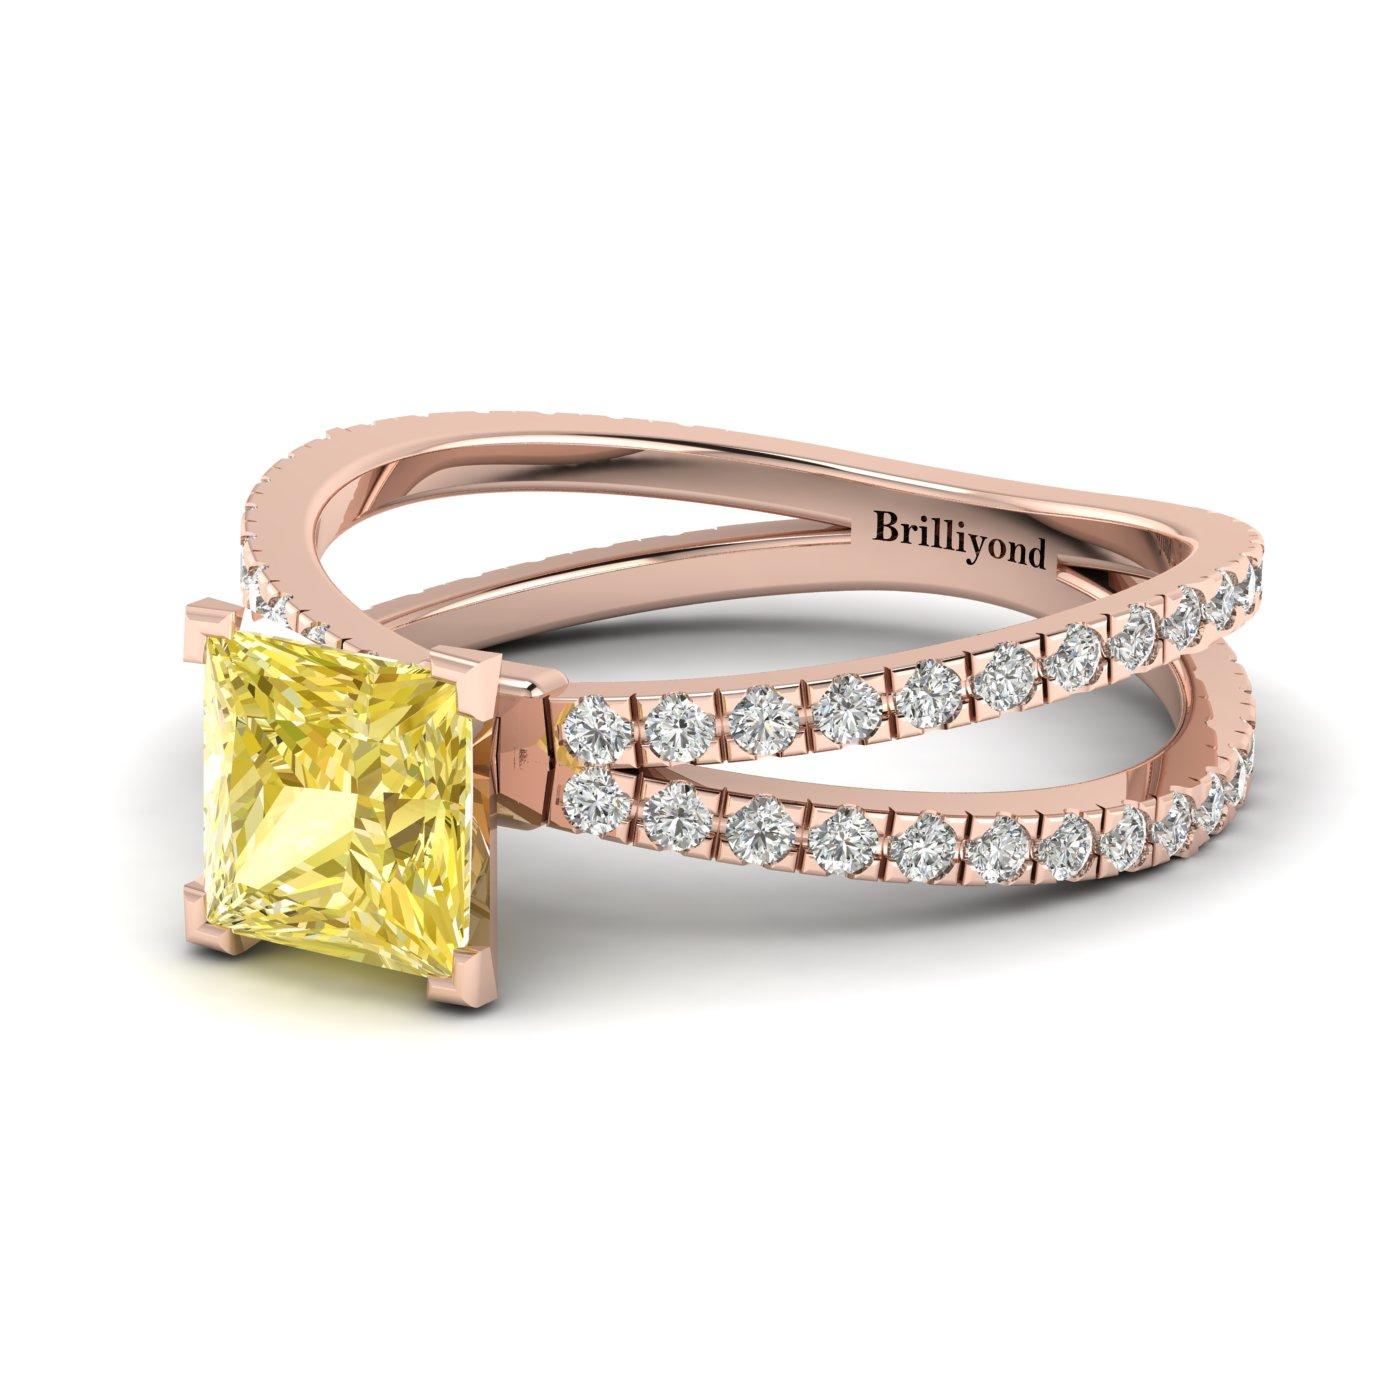 Princess Cut Engagement Ring Florentine